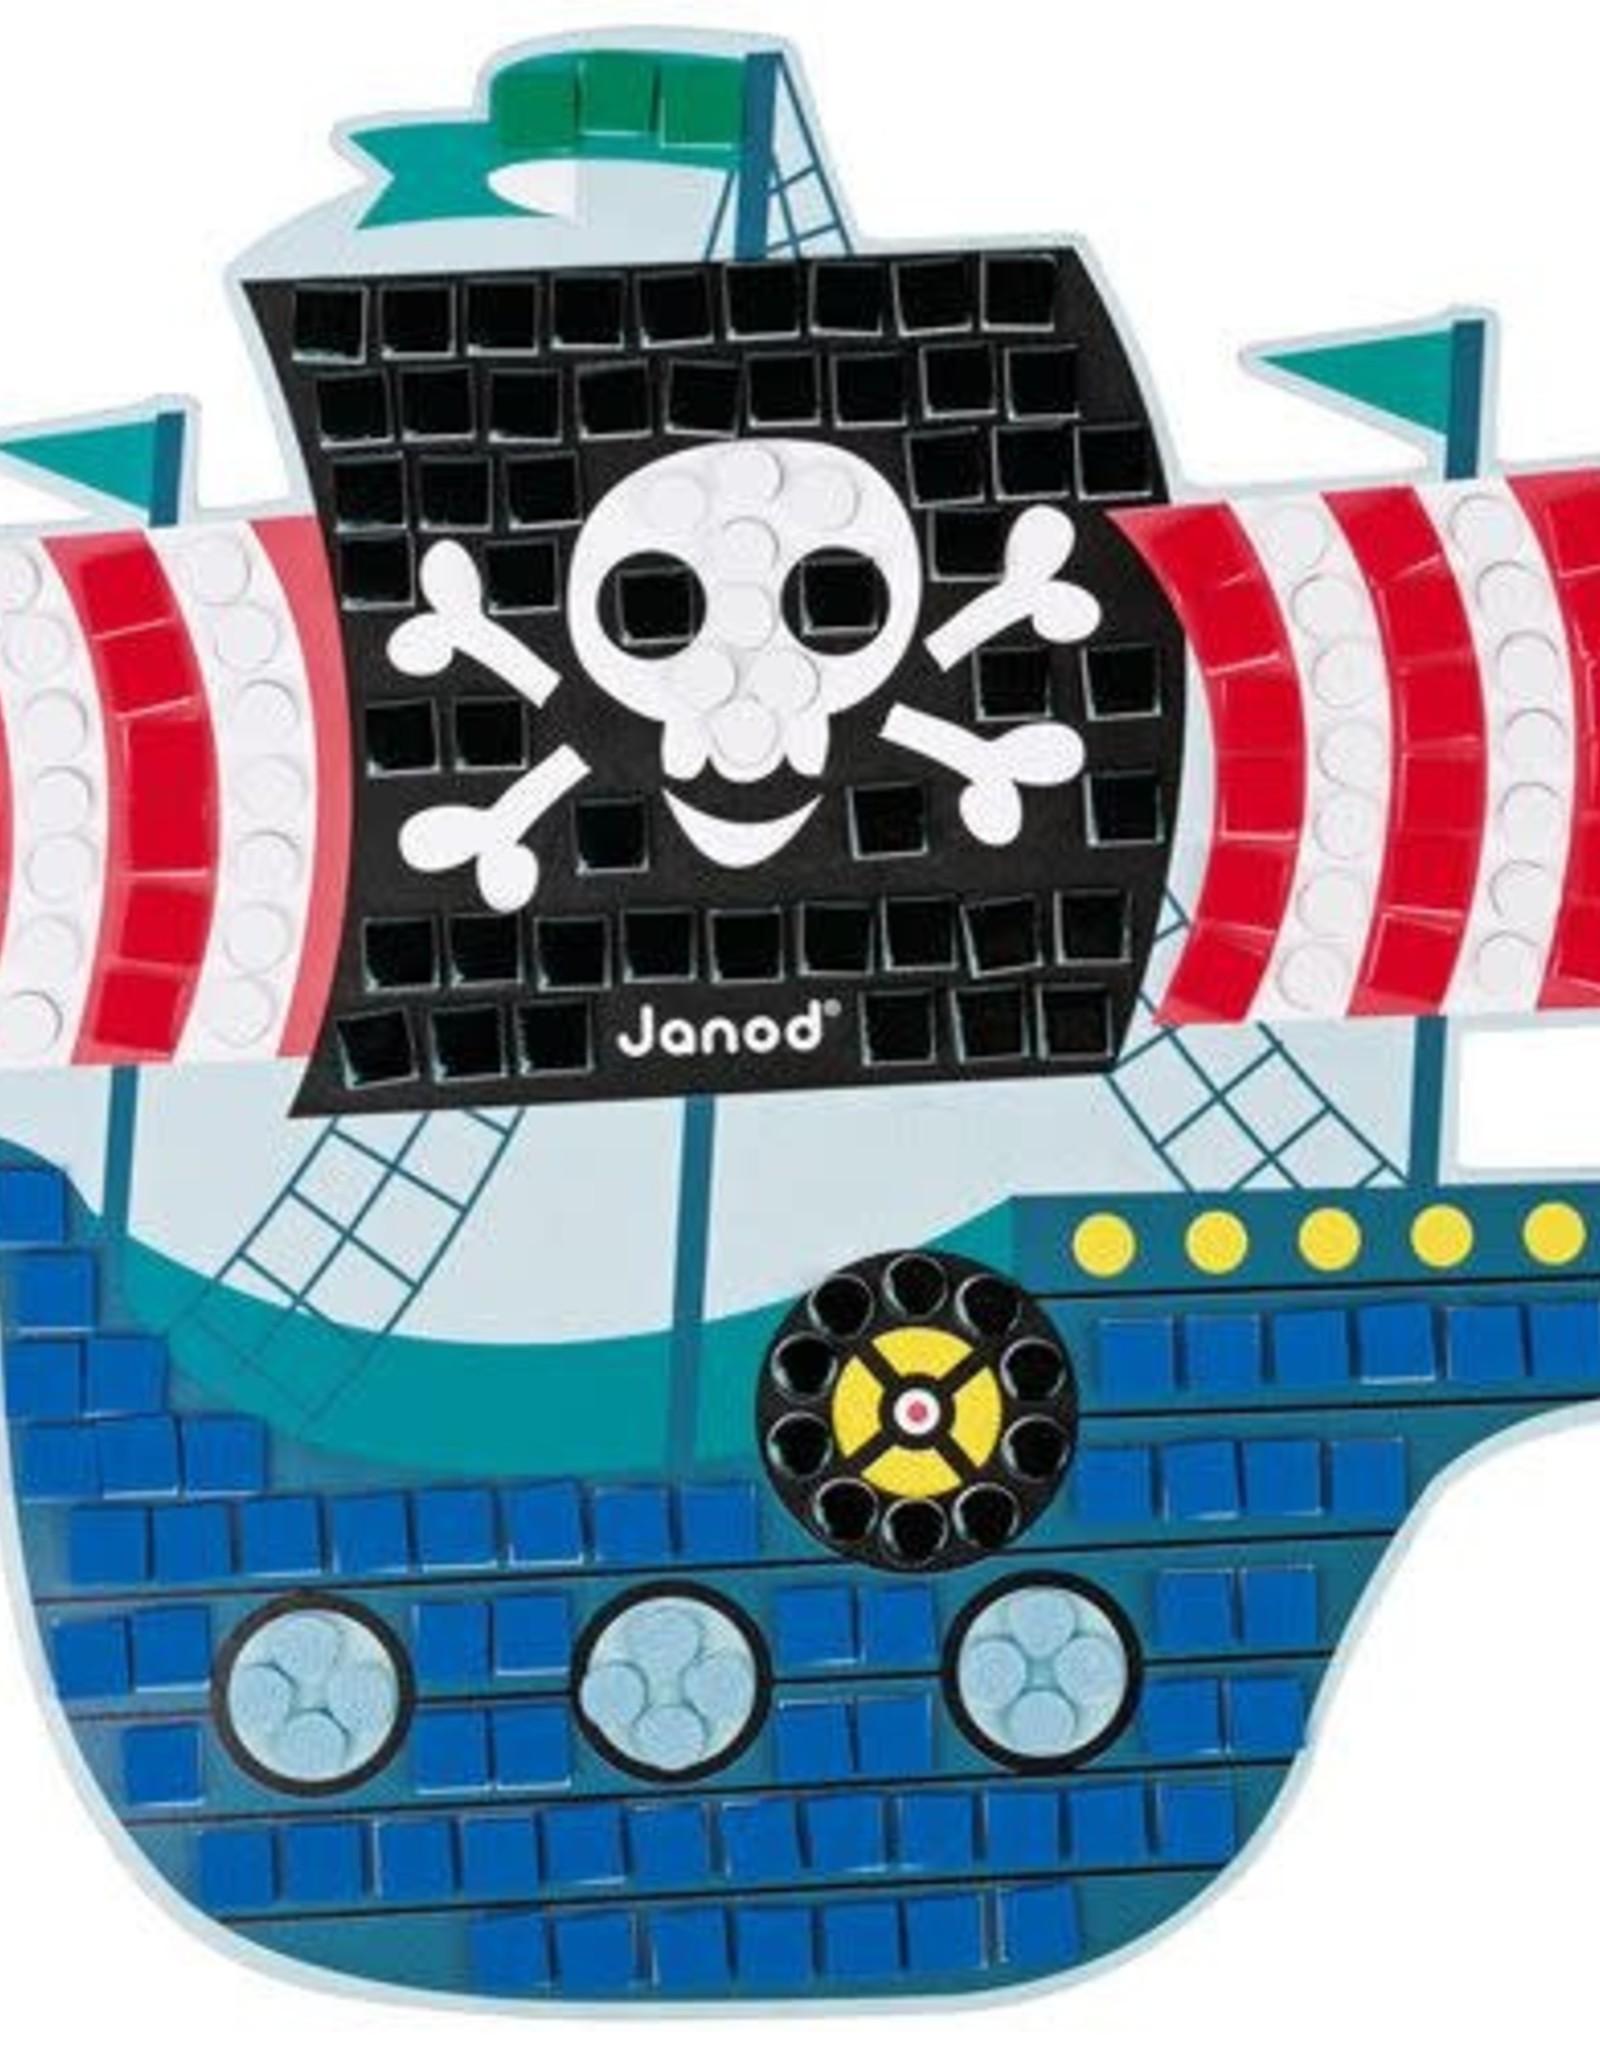 Janod Mozaïek Piraten - Janod Atelier